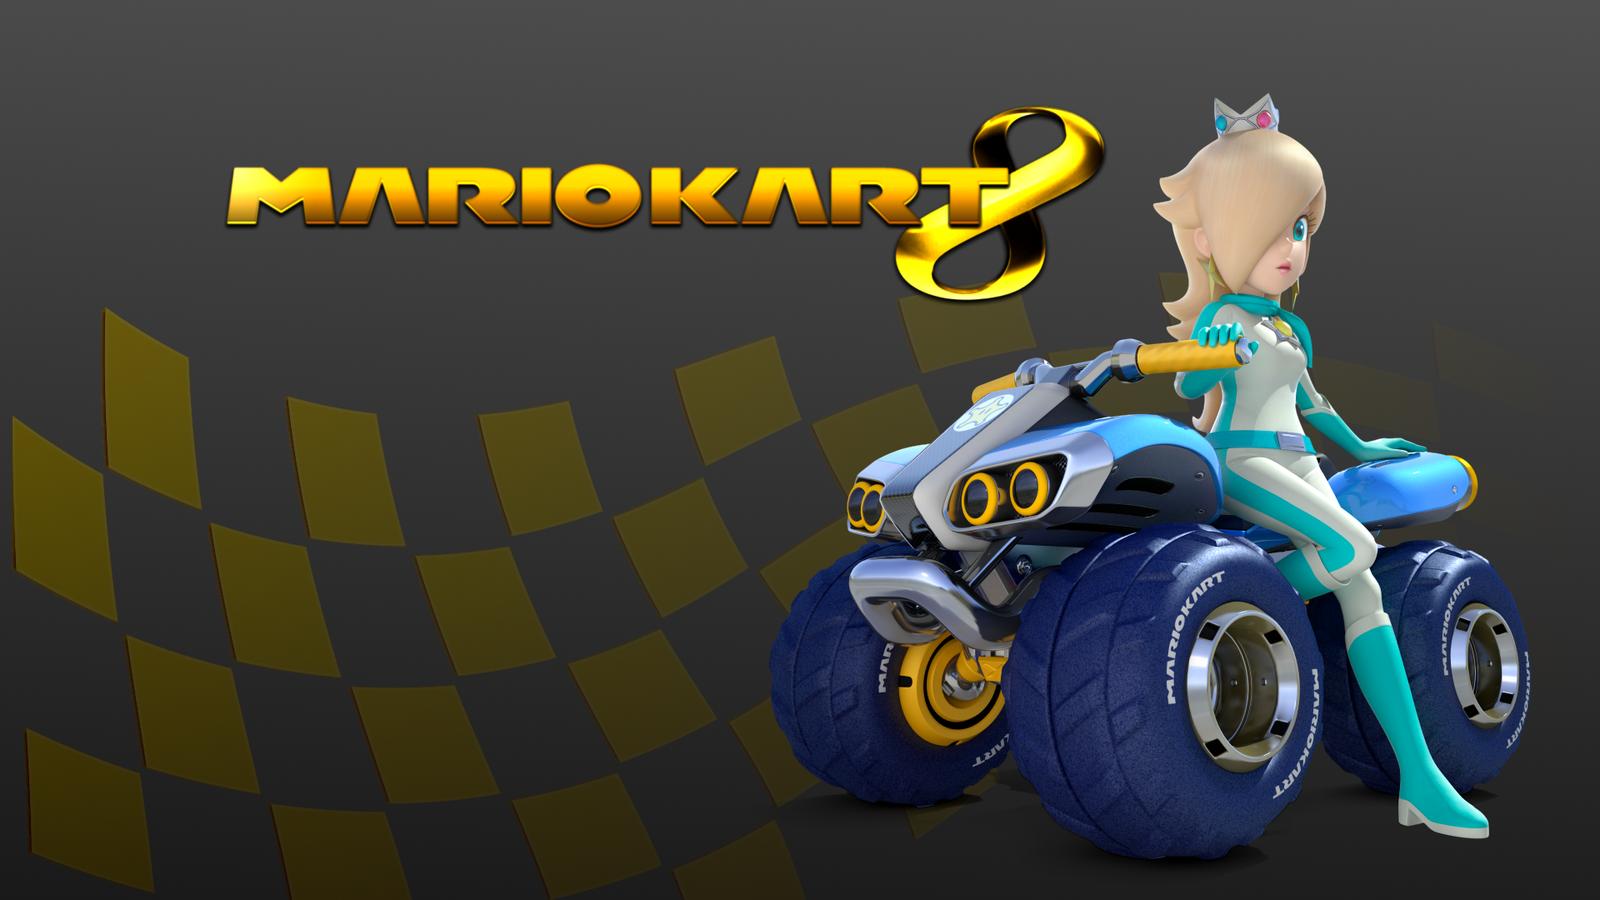 Mario Kart 8 Wallpaper: Golden Mario Kart 8 Wallpaper